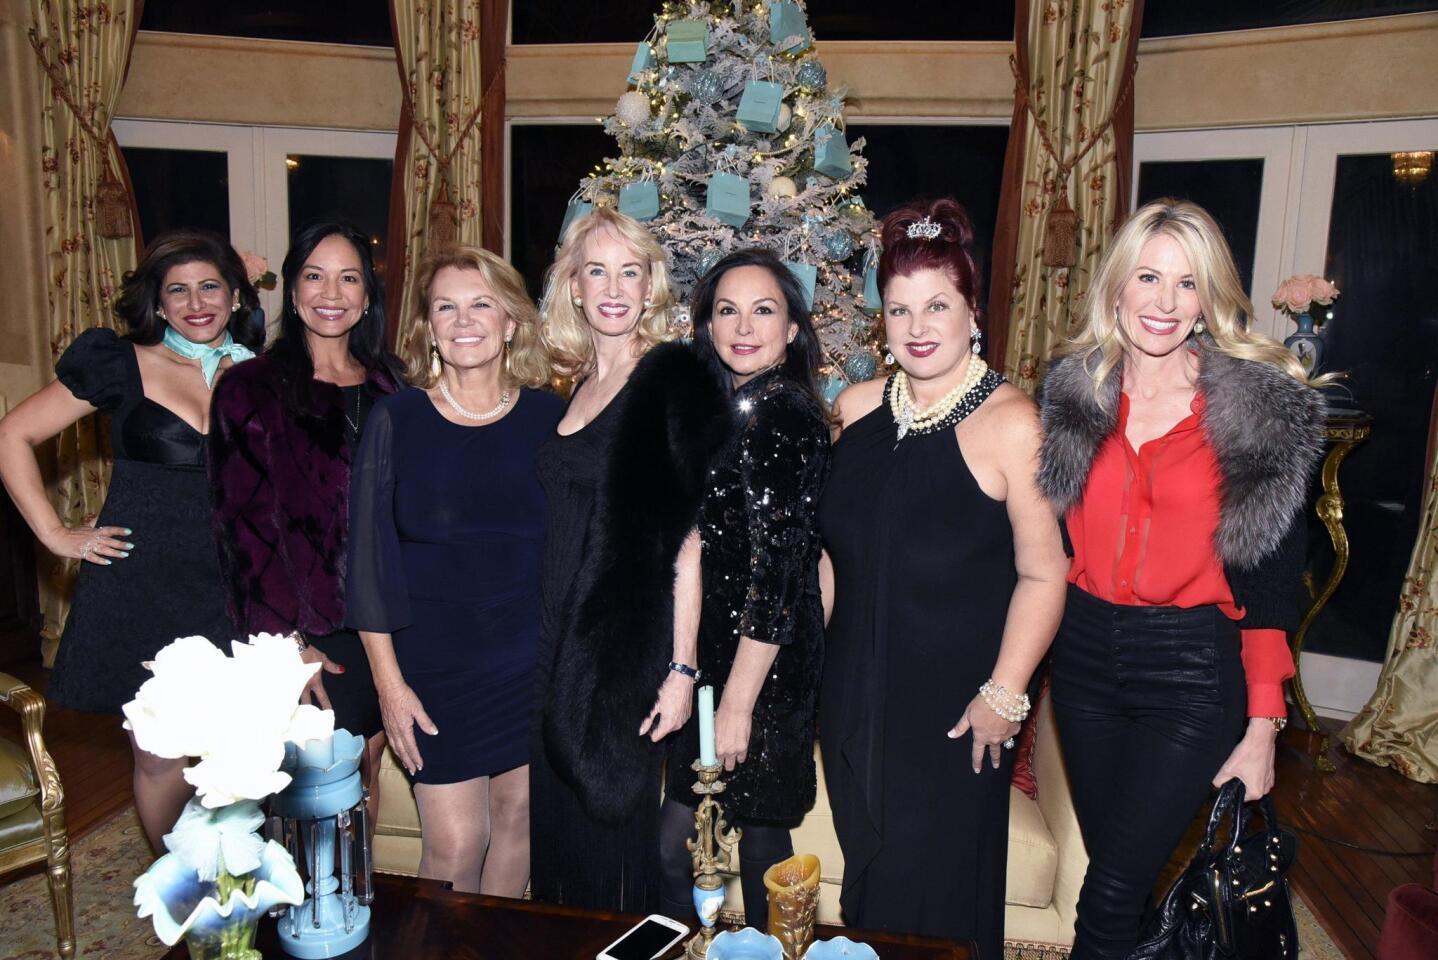 'Holidays at Tiffany's' event benefits Miracle Babies